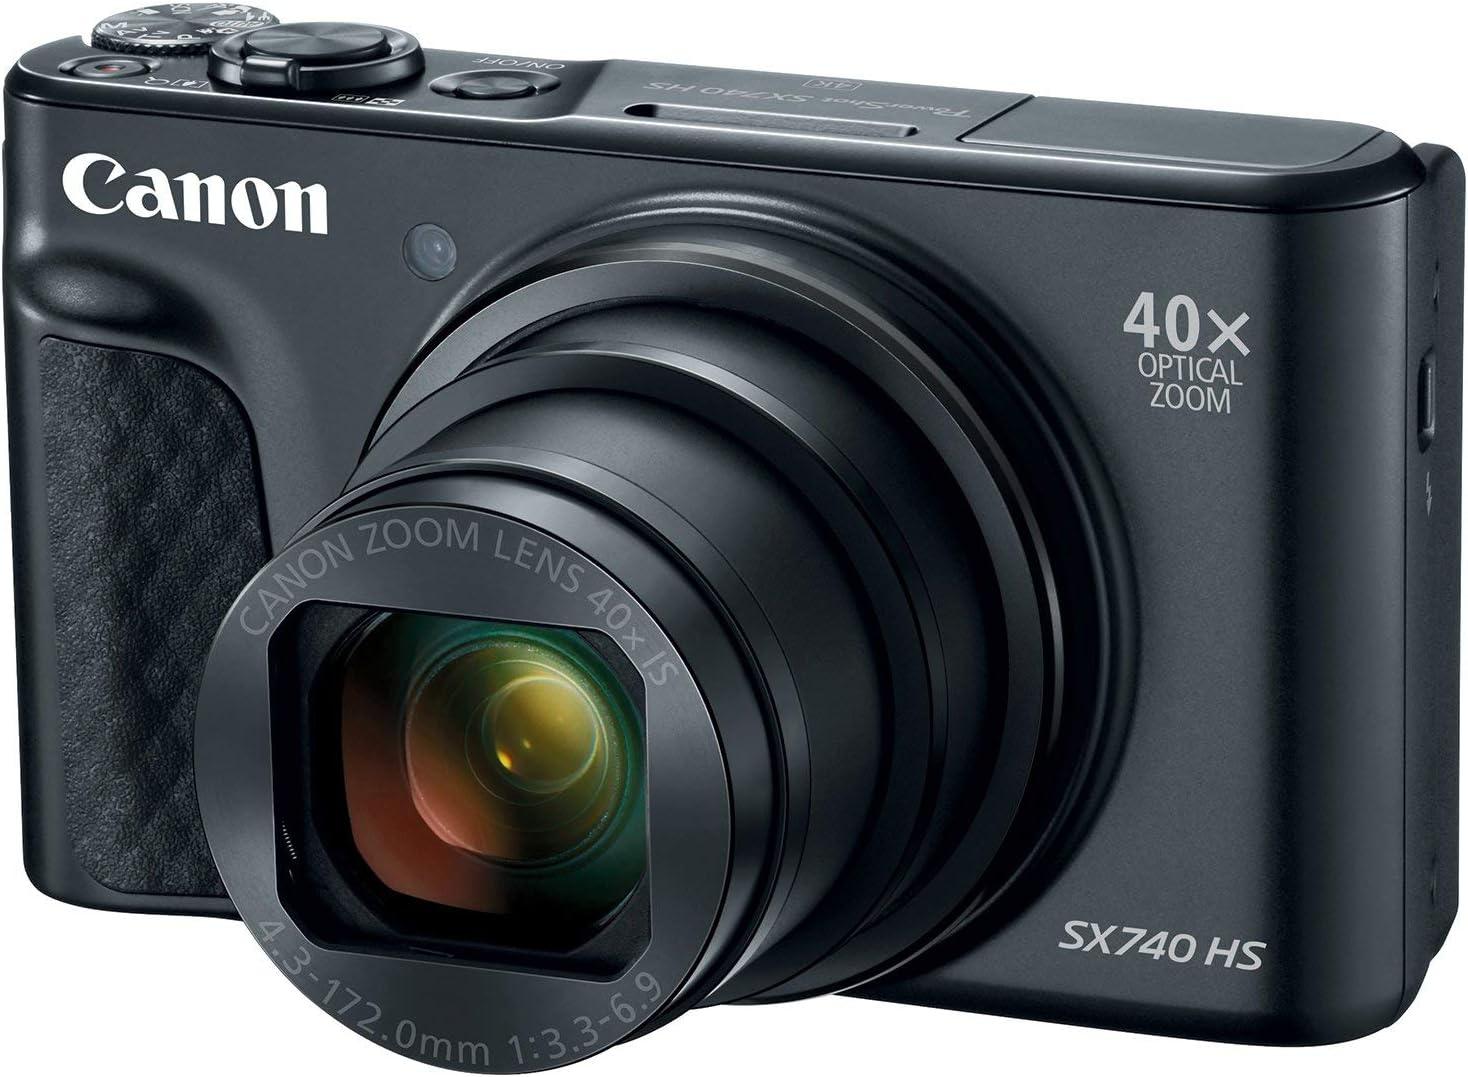 Canon PowerShot SX740 Digital Camera w/40x Optical Zoom & 3 Inch Tilt LCD - 4K VIdeo, Wi-Fi, NFC, Bluetooth Enabled (Black) (Renewed)